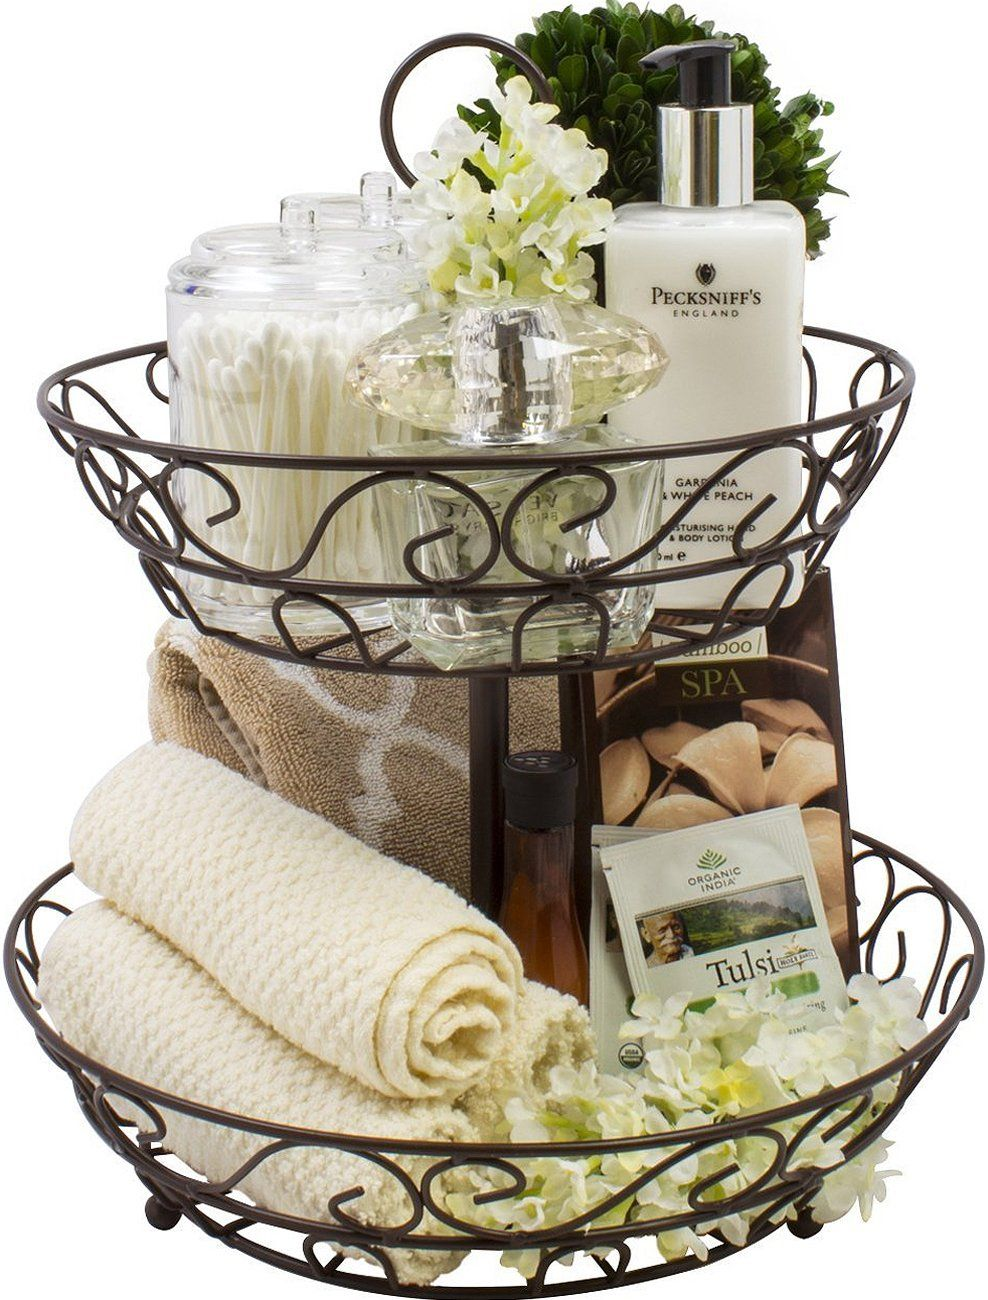 Sorbus 2tier Countertop Fruit Basket Holder And Decorative Bowl